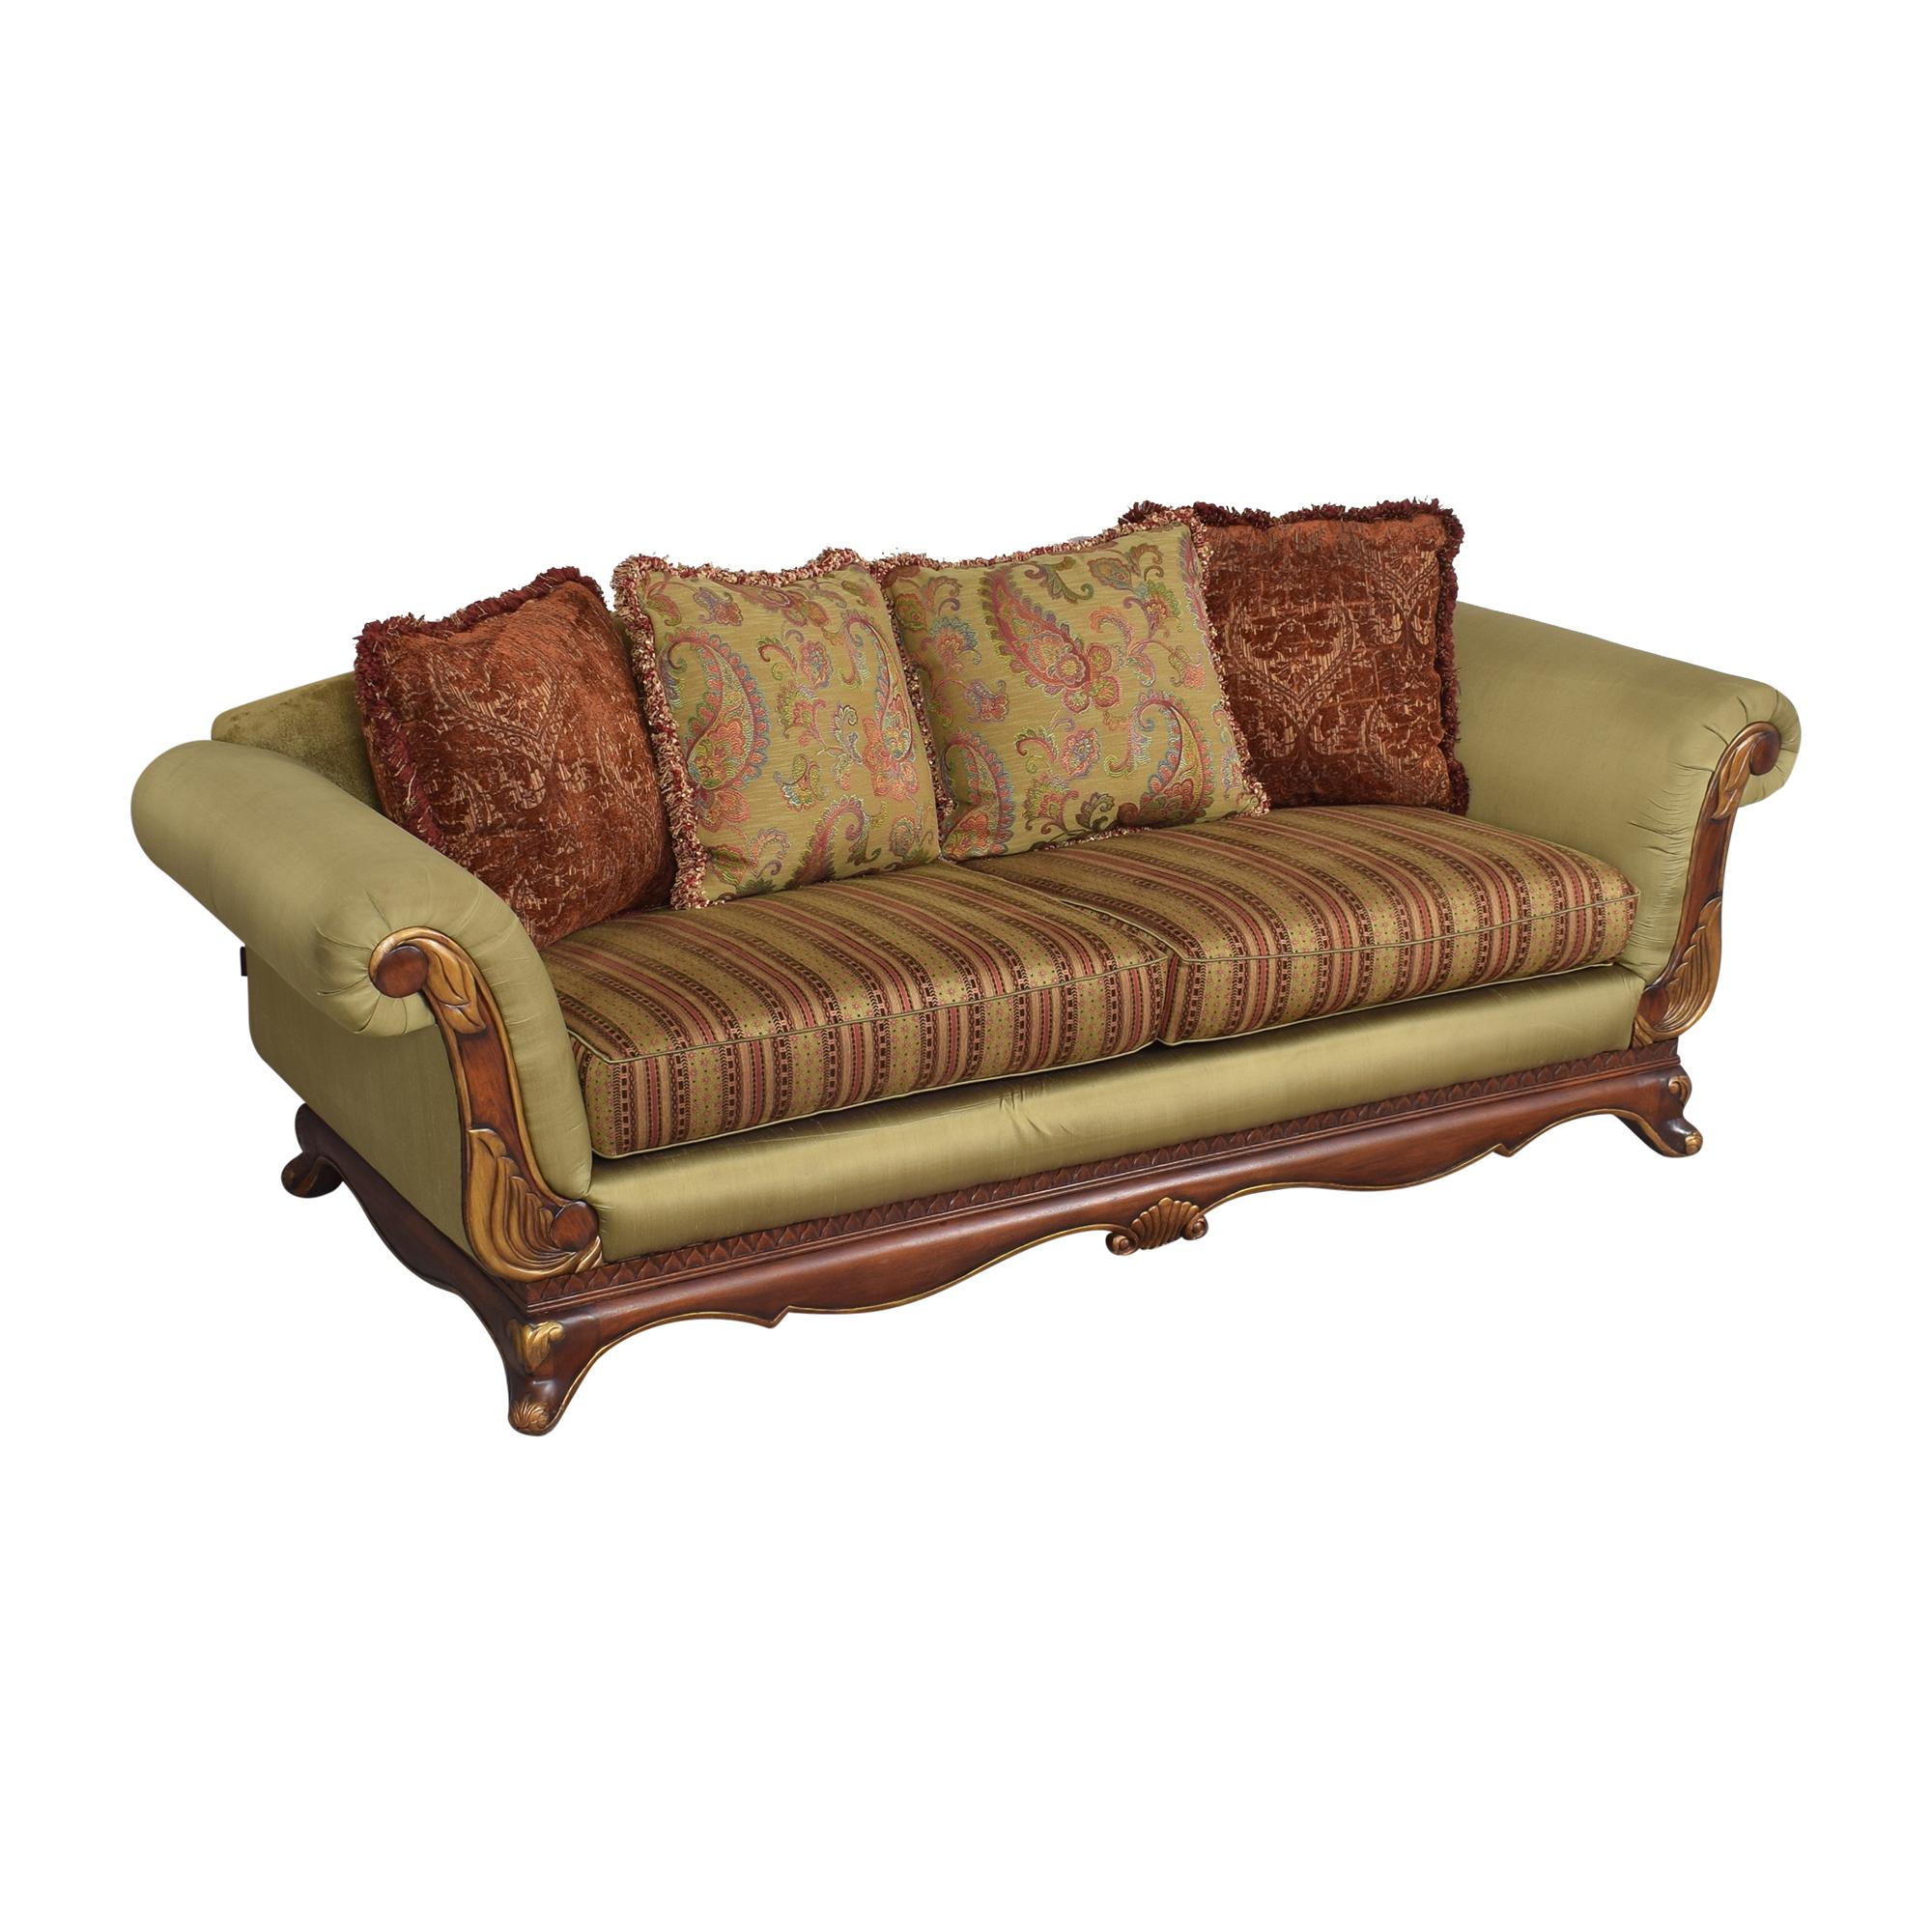 buy Raymour & Flanigan Raymour & Flanigan Roll Arm Sofa online